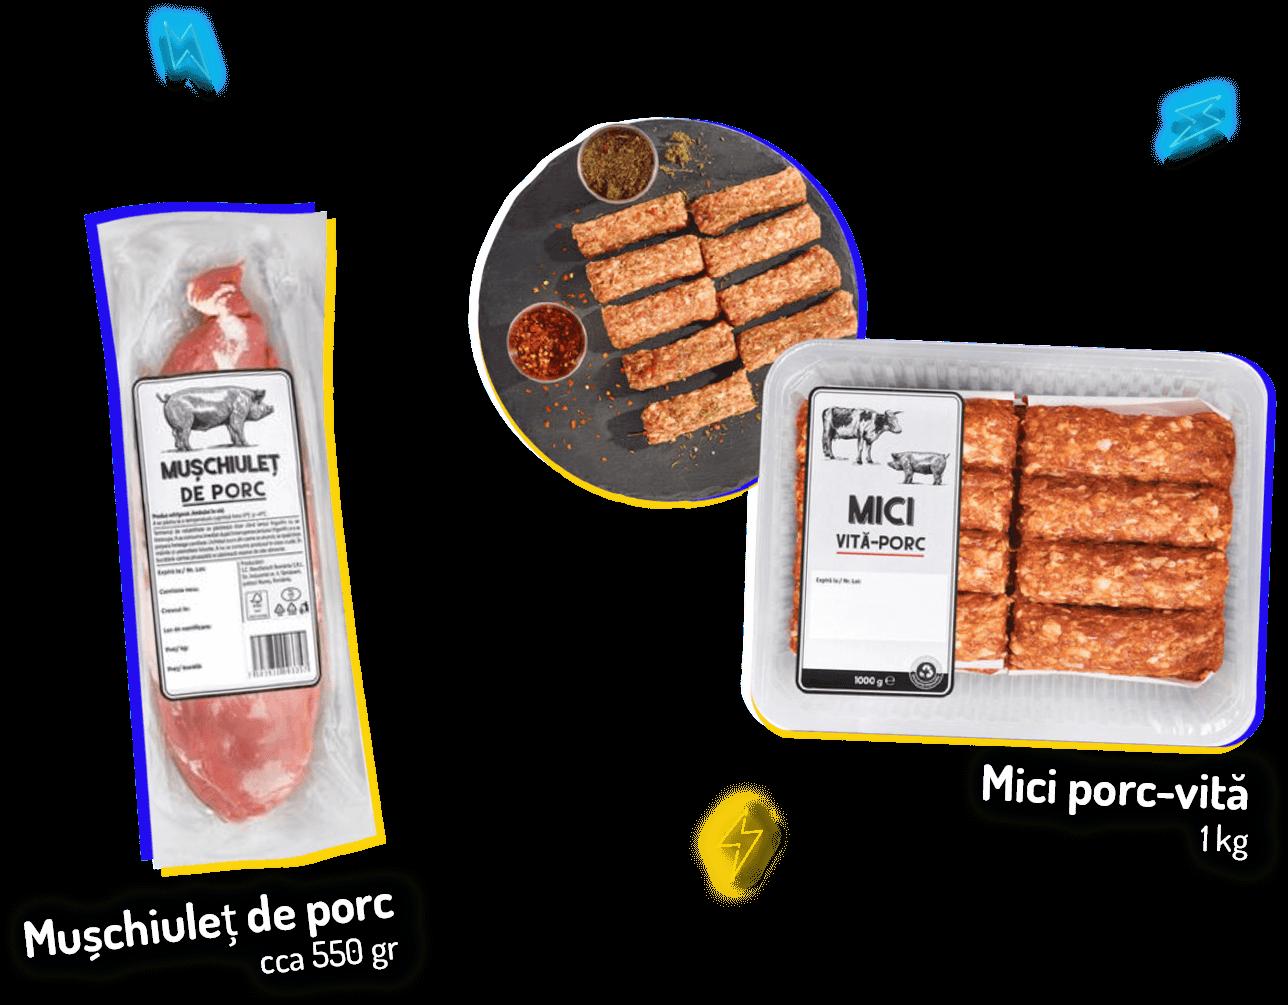 Mușchiuleț de porc cca 550 gr, Mici porc-vită 1kg